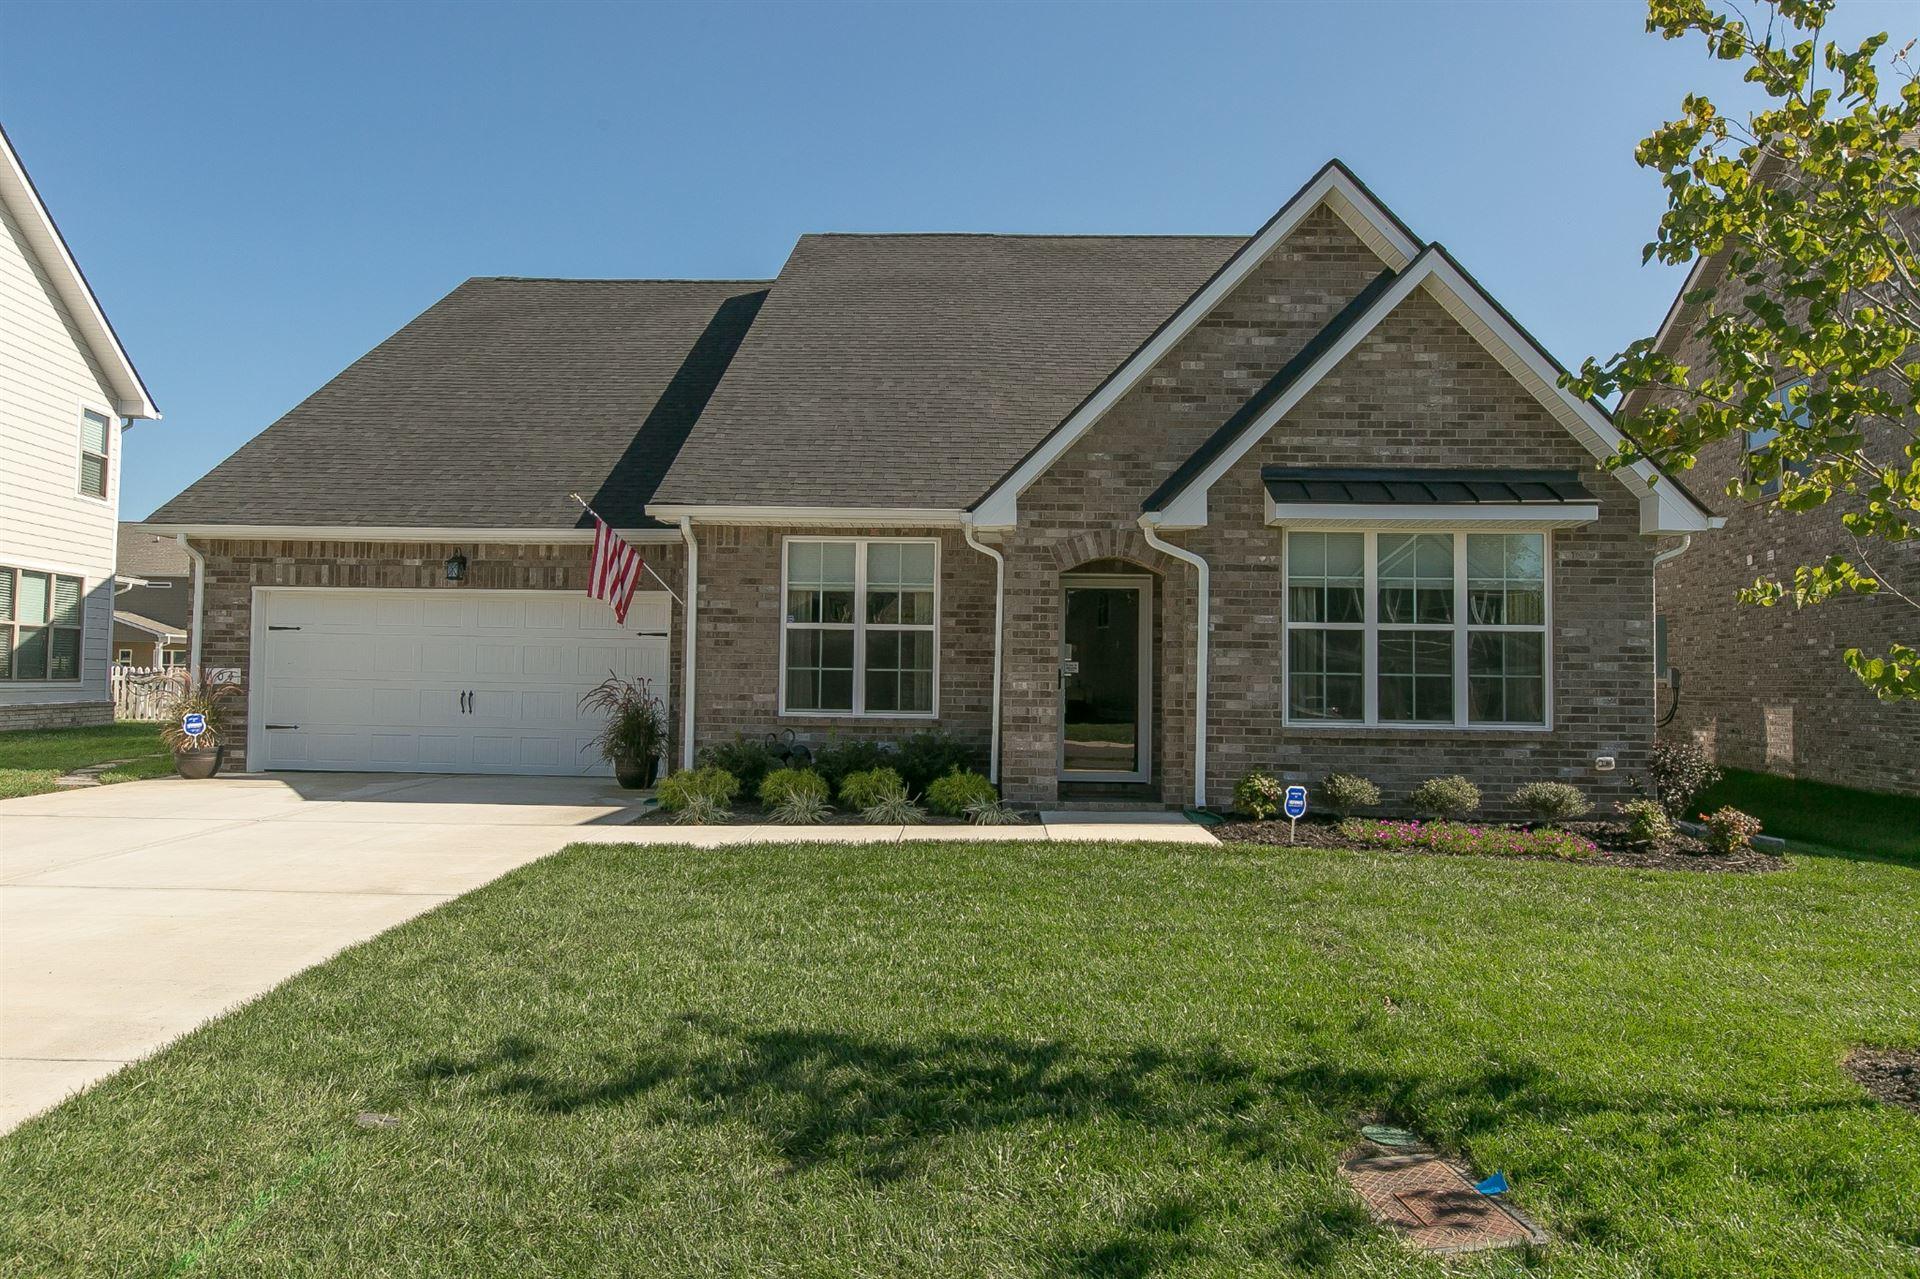 104 Neecee Drive, Smyrna, TN 37167 - MLS#: 2207147